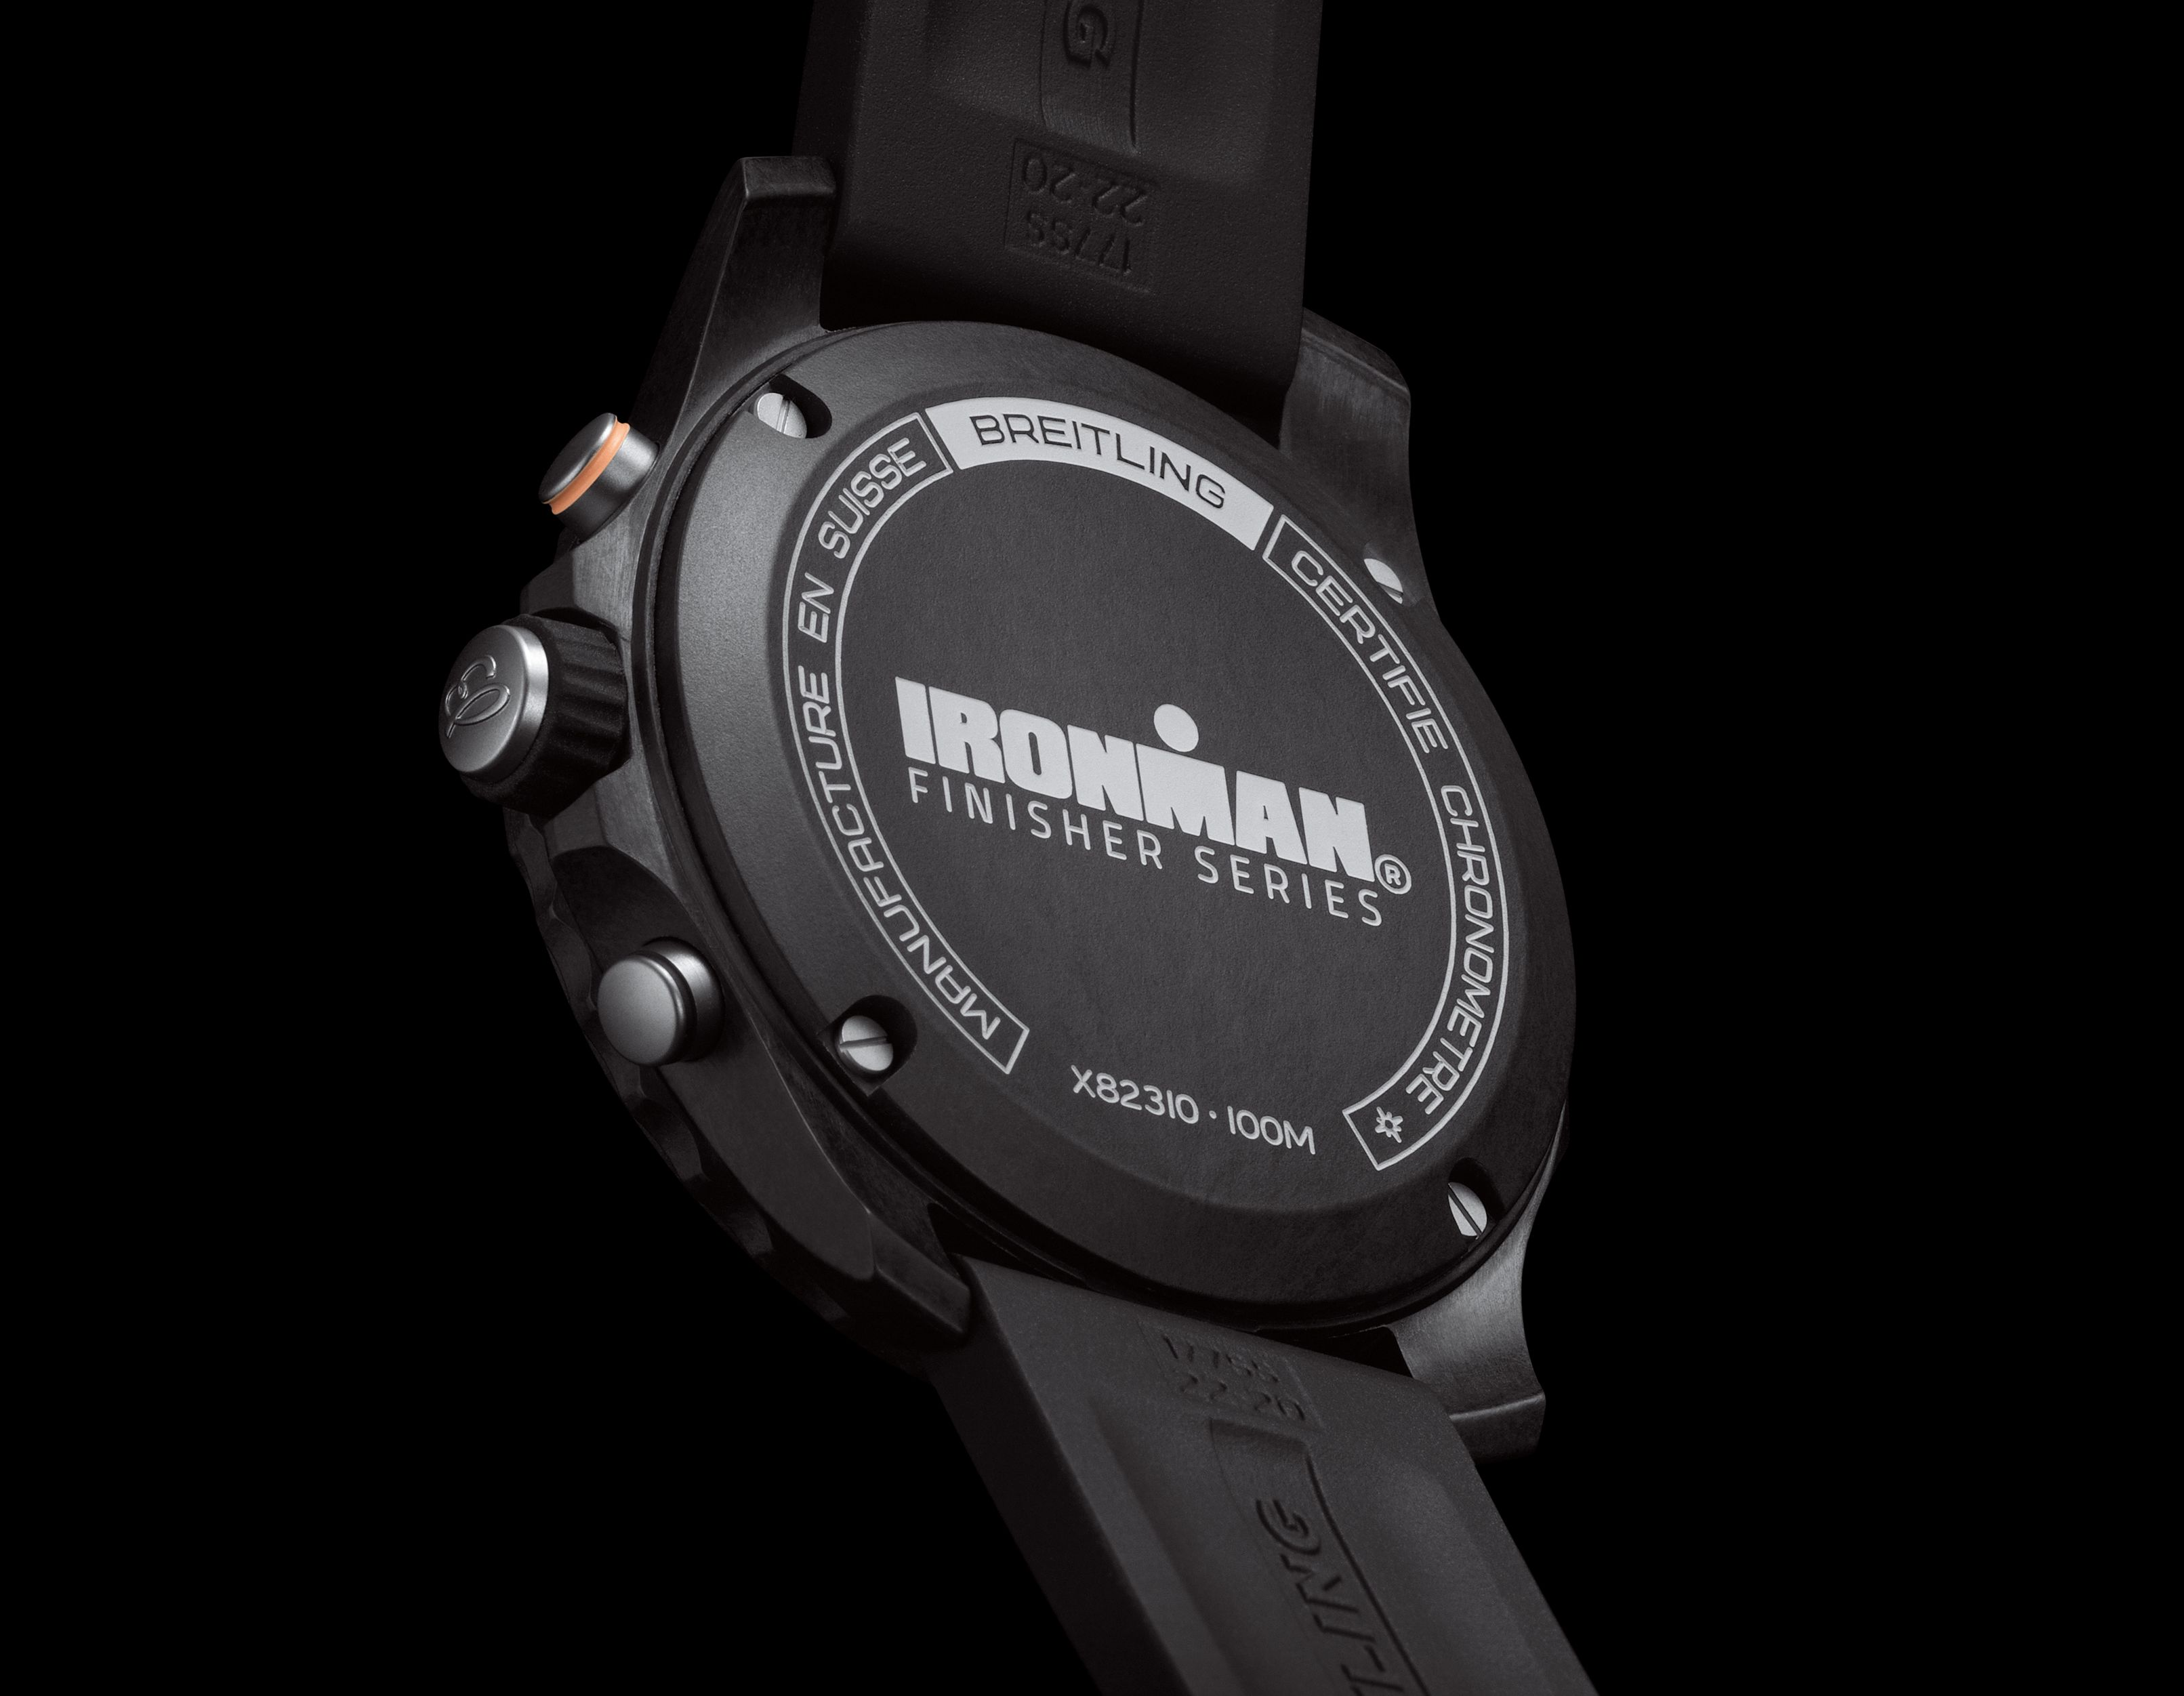 Breitling Endurance Pro Ironman Finisher